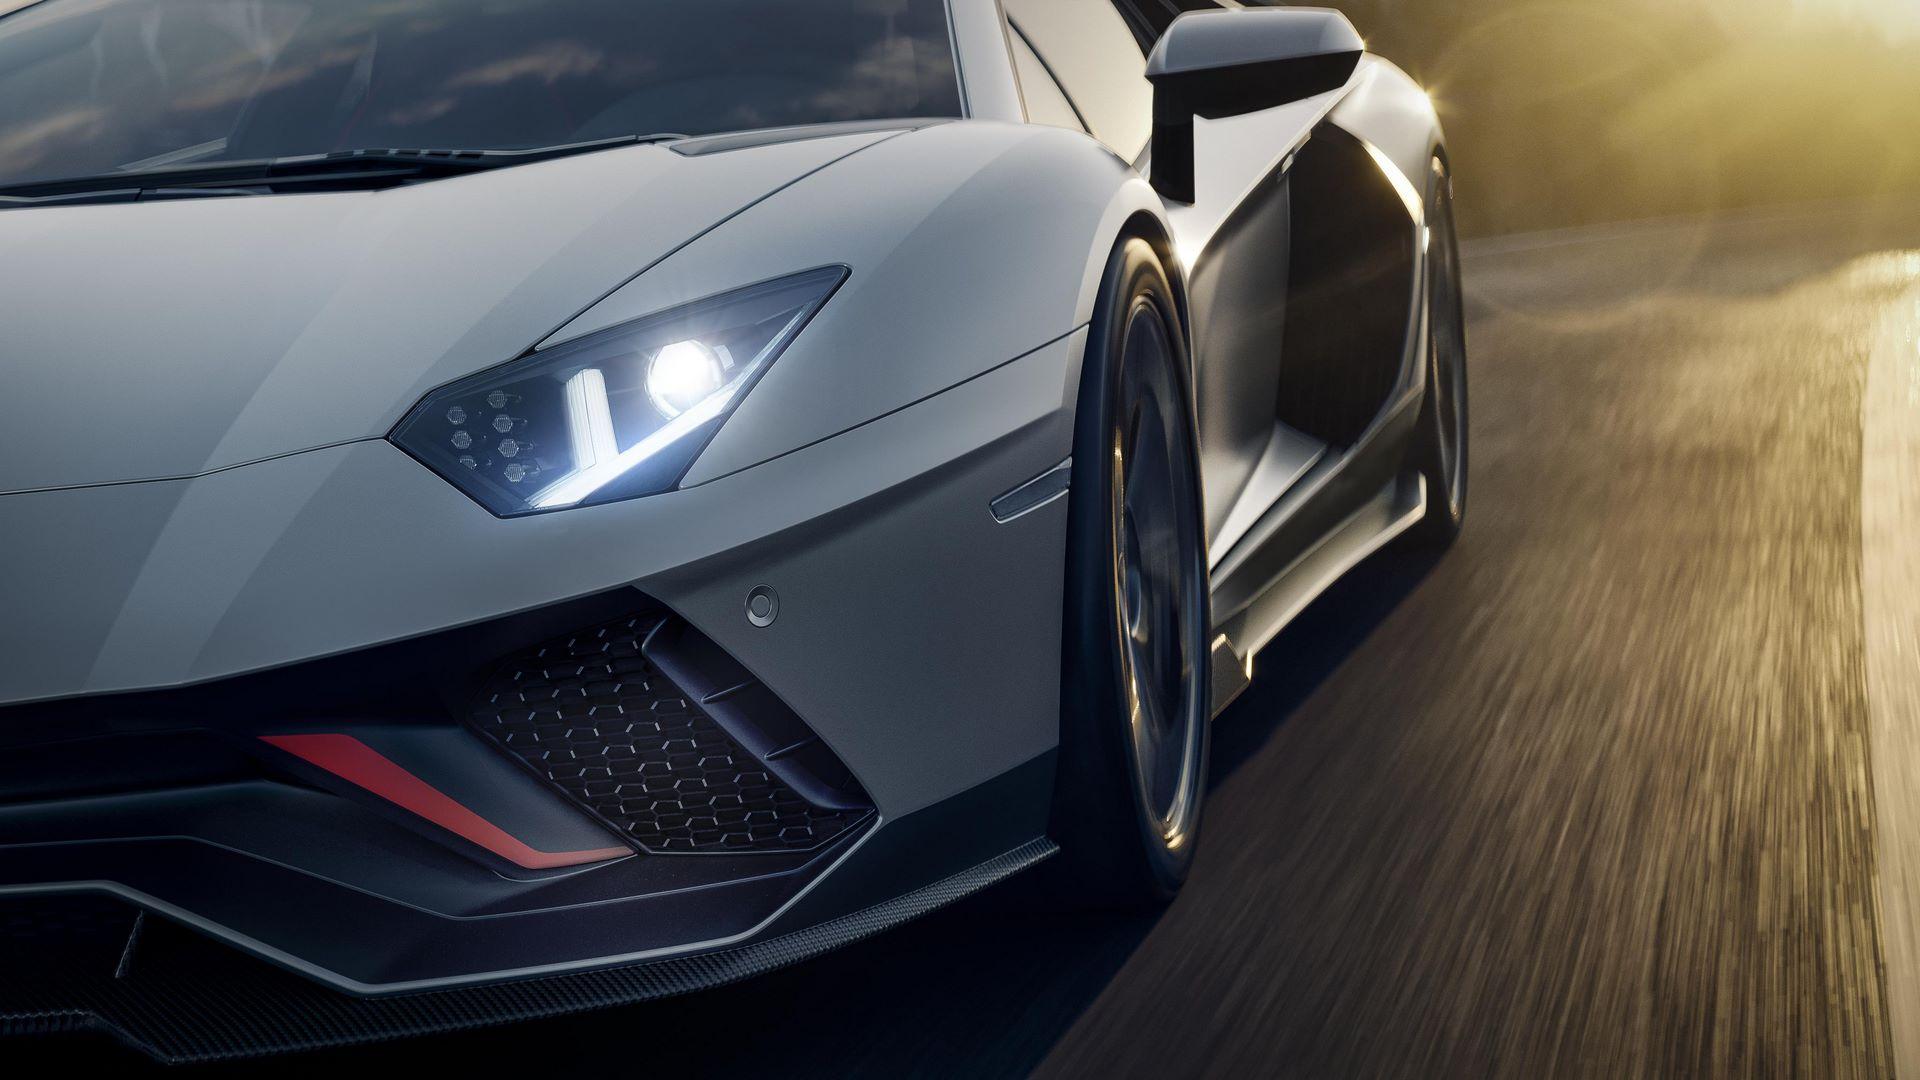 Lamborghini-Aventador-LP780-4-Ultimae-7